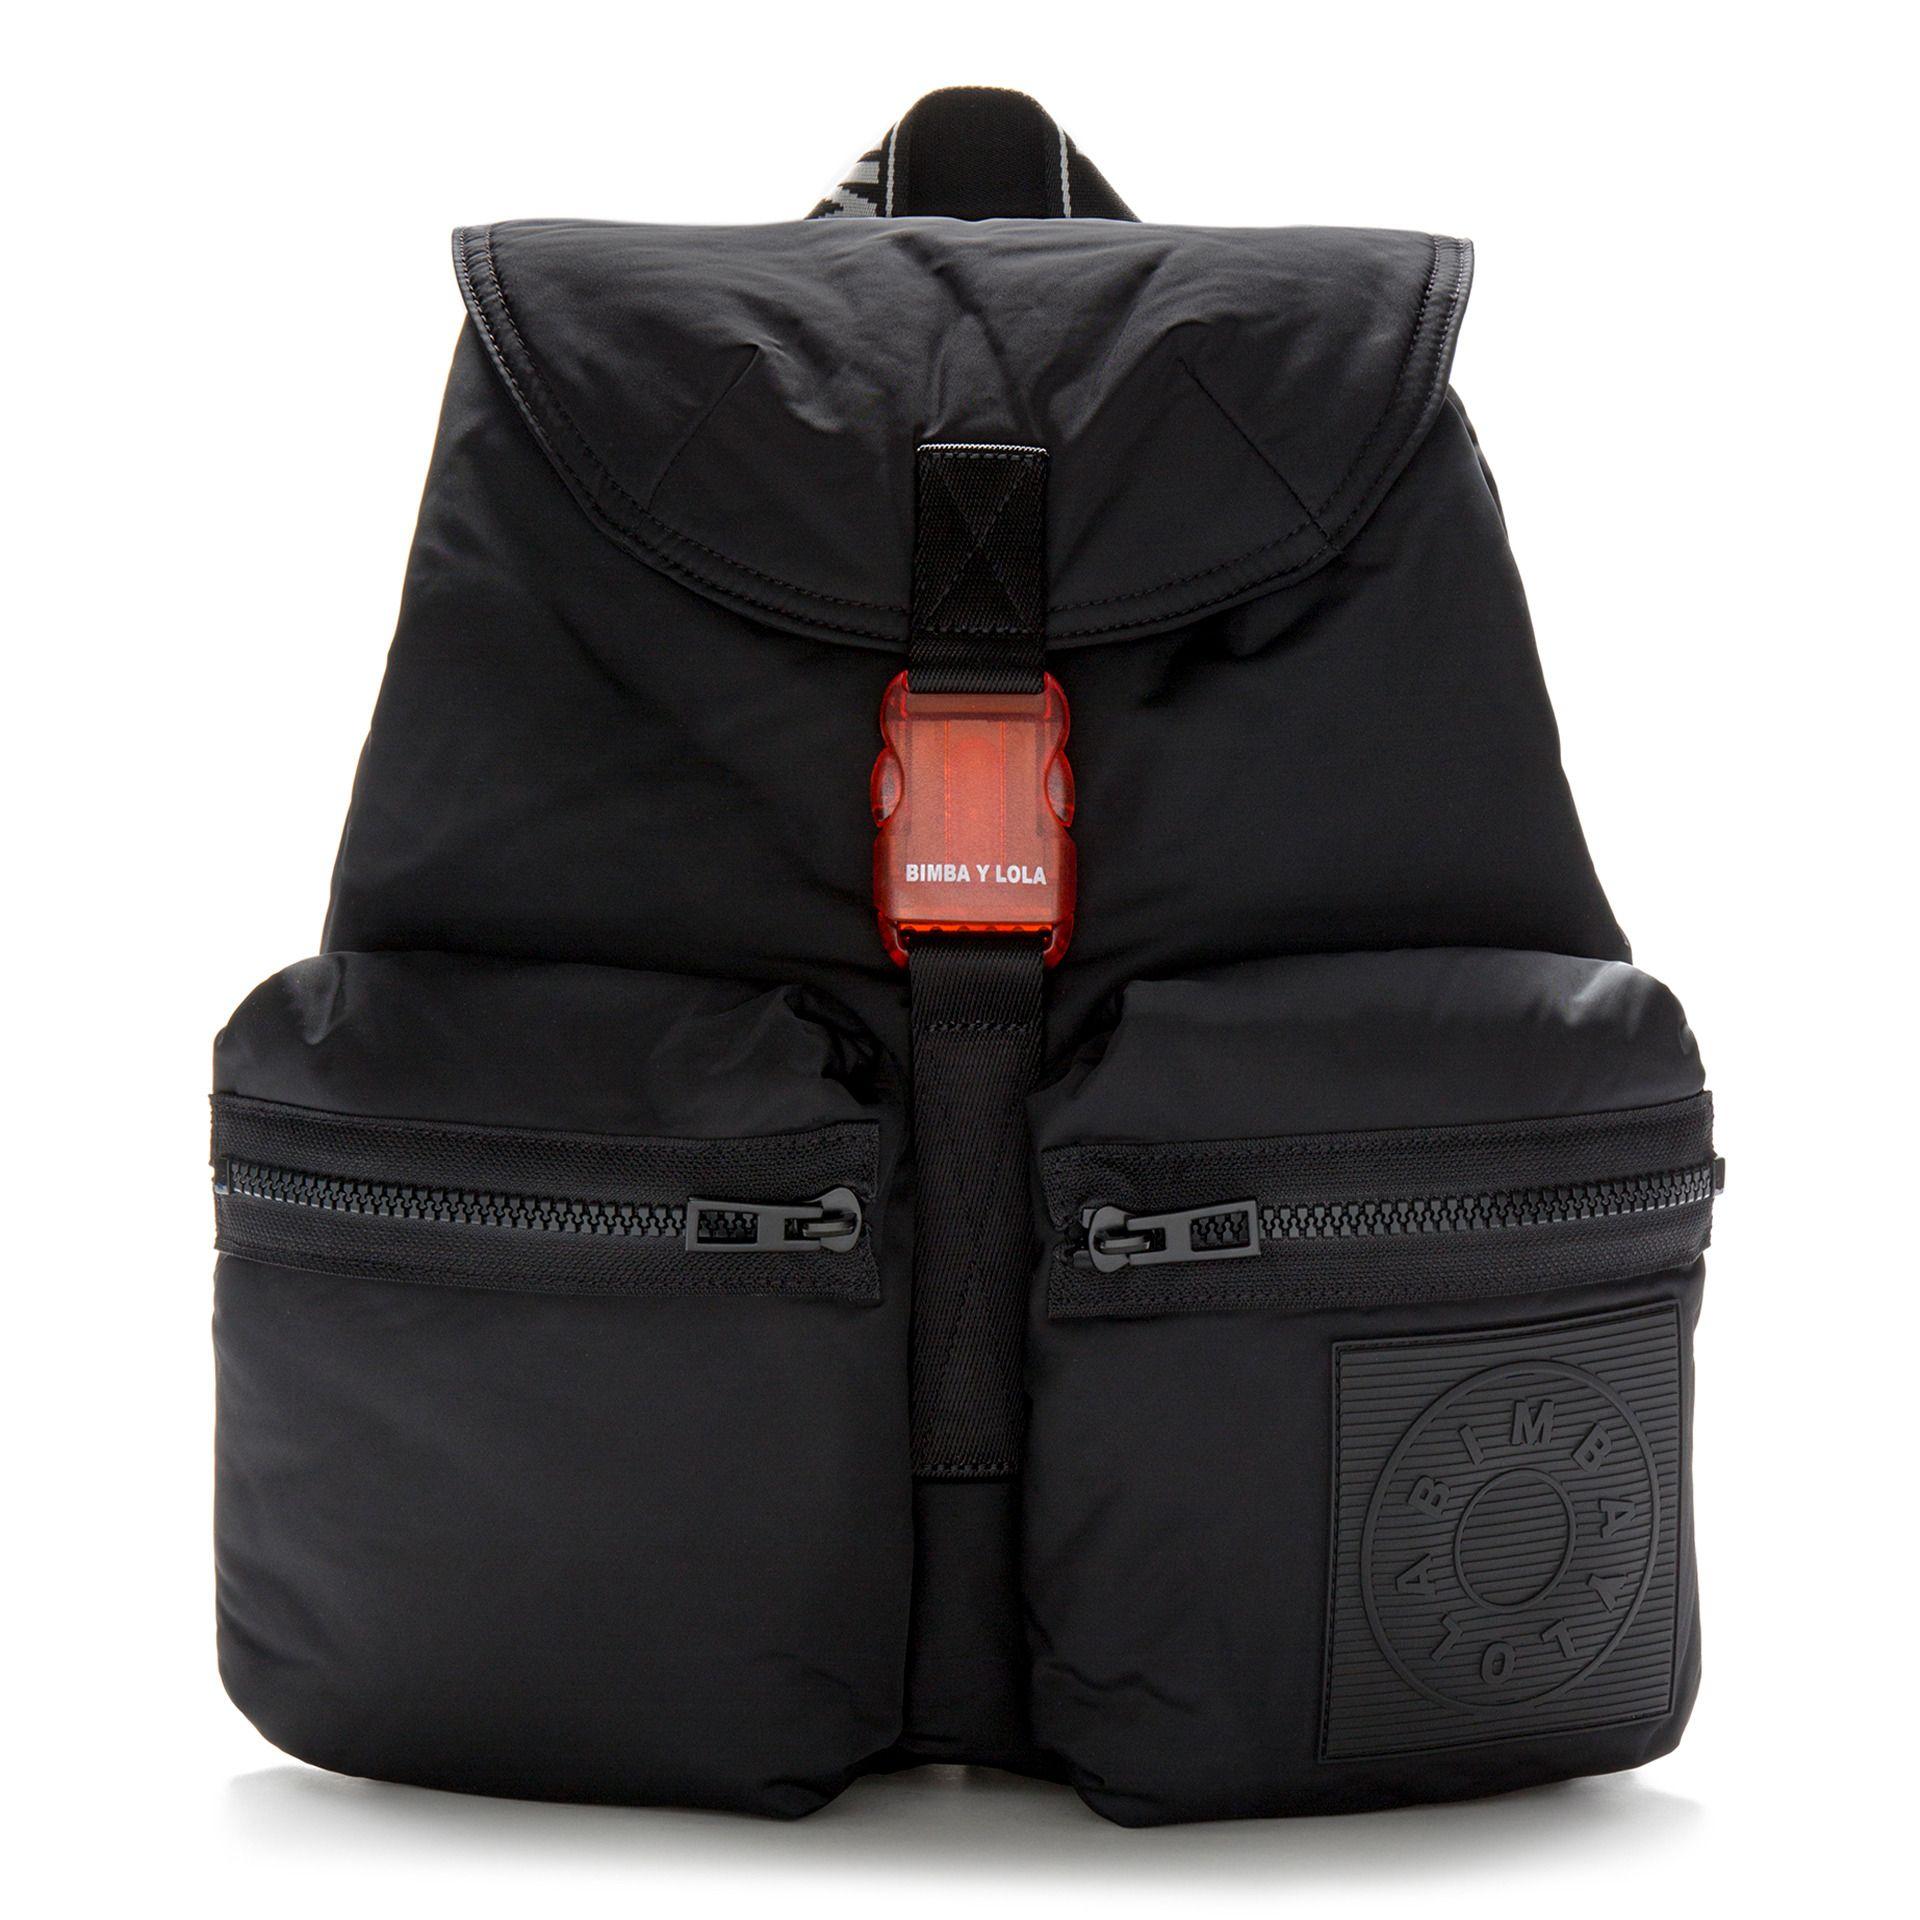 3818d46e5 Mochila grande acolchada negra | BIMBA Y LOLA | Bags, Womens fashion ...